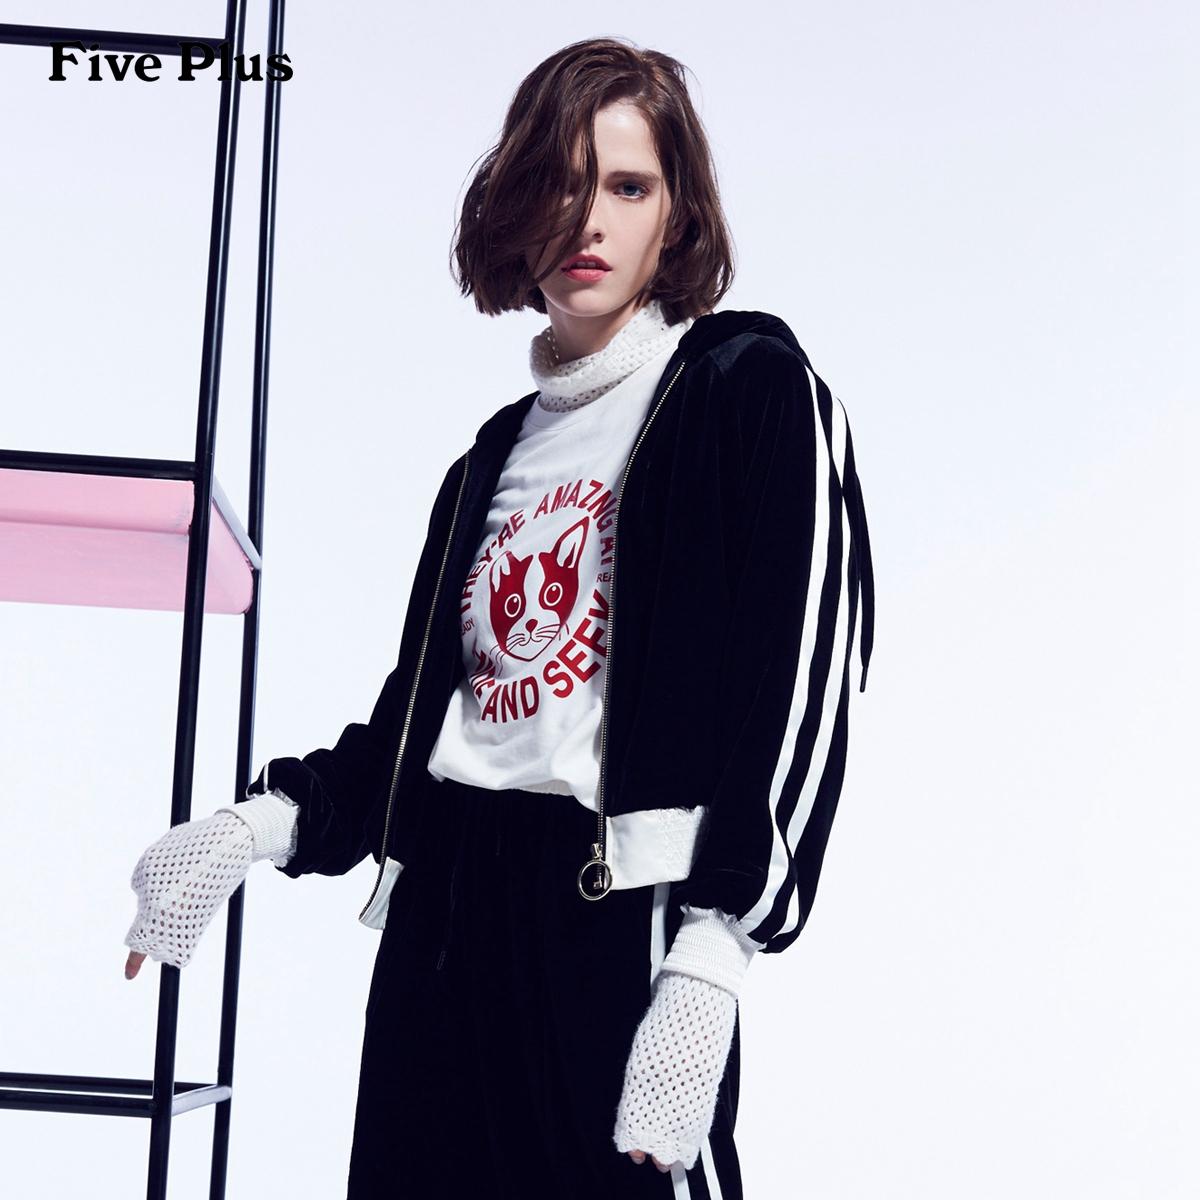 Five Plus2018新款女装卫衣运动服女条纹连帽丝绒外套潮长袖街头